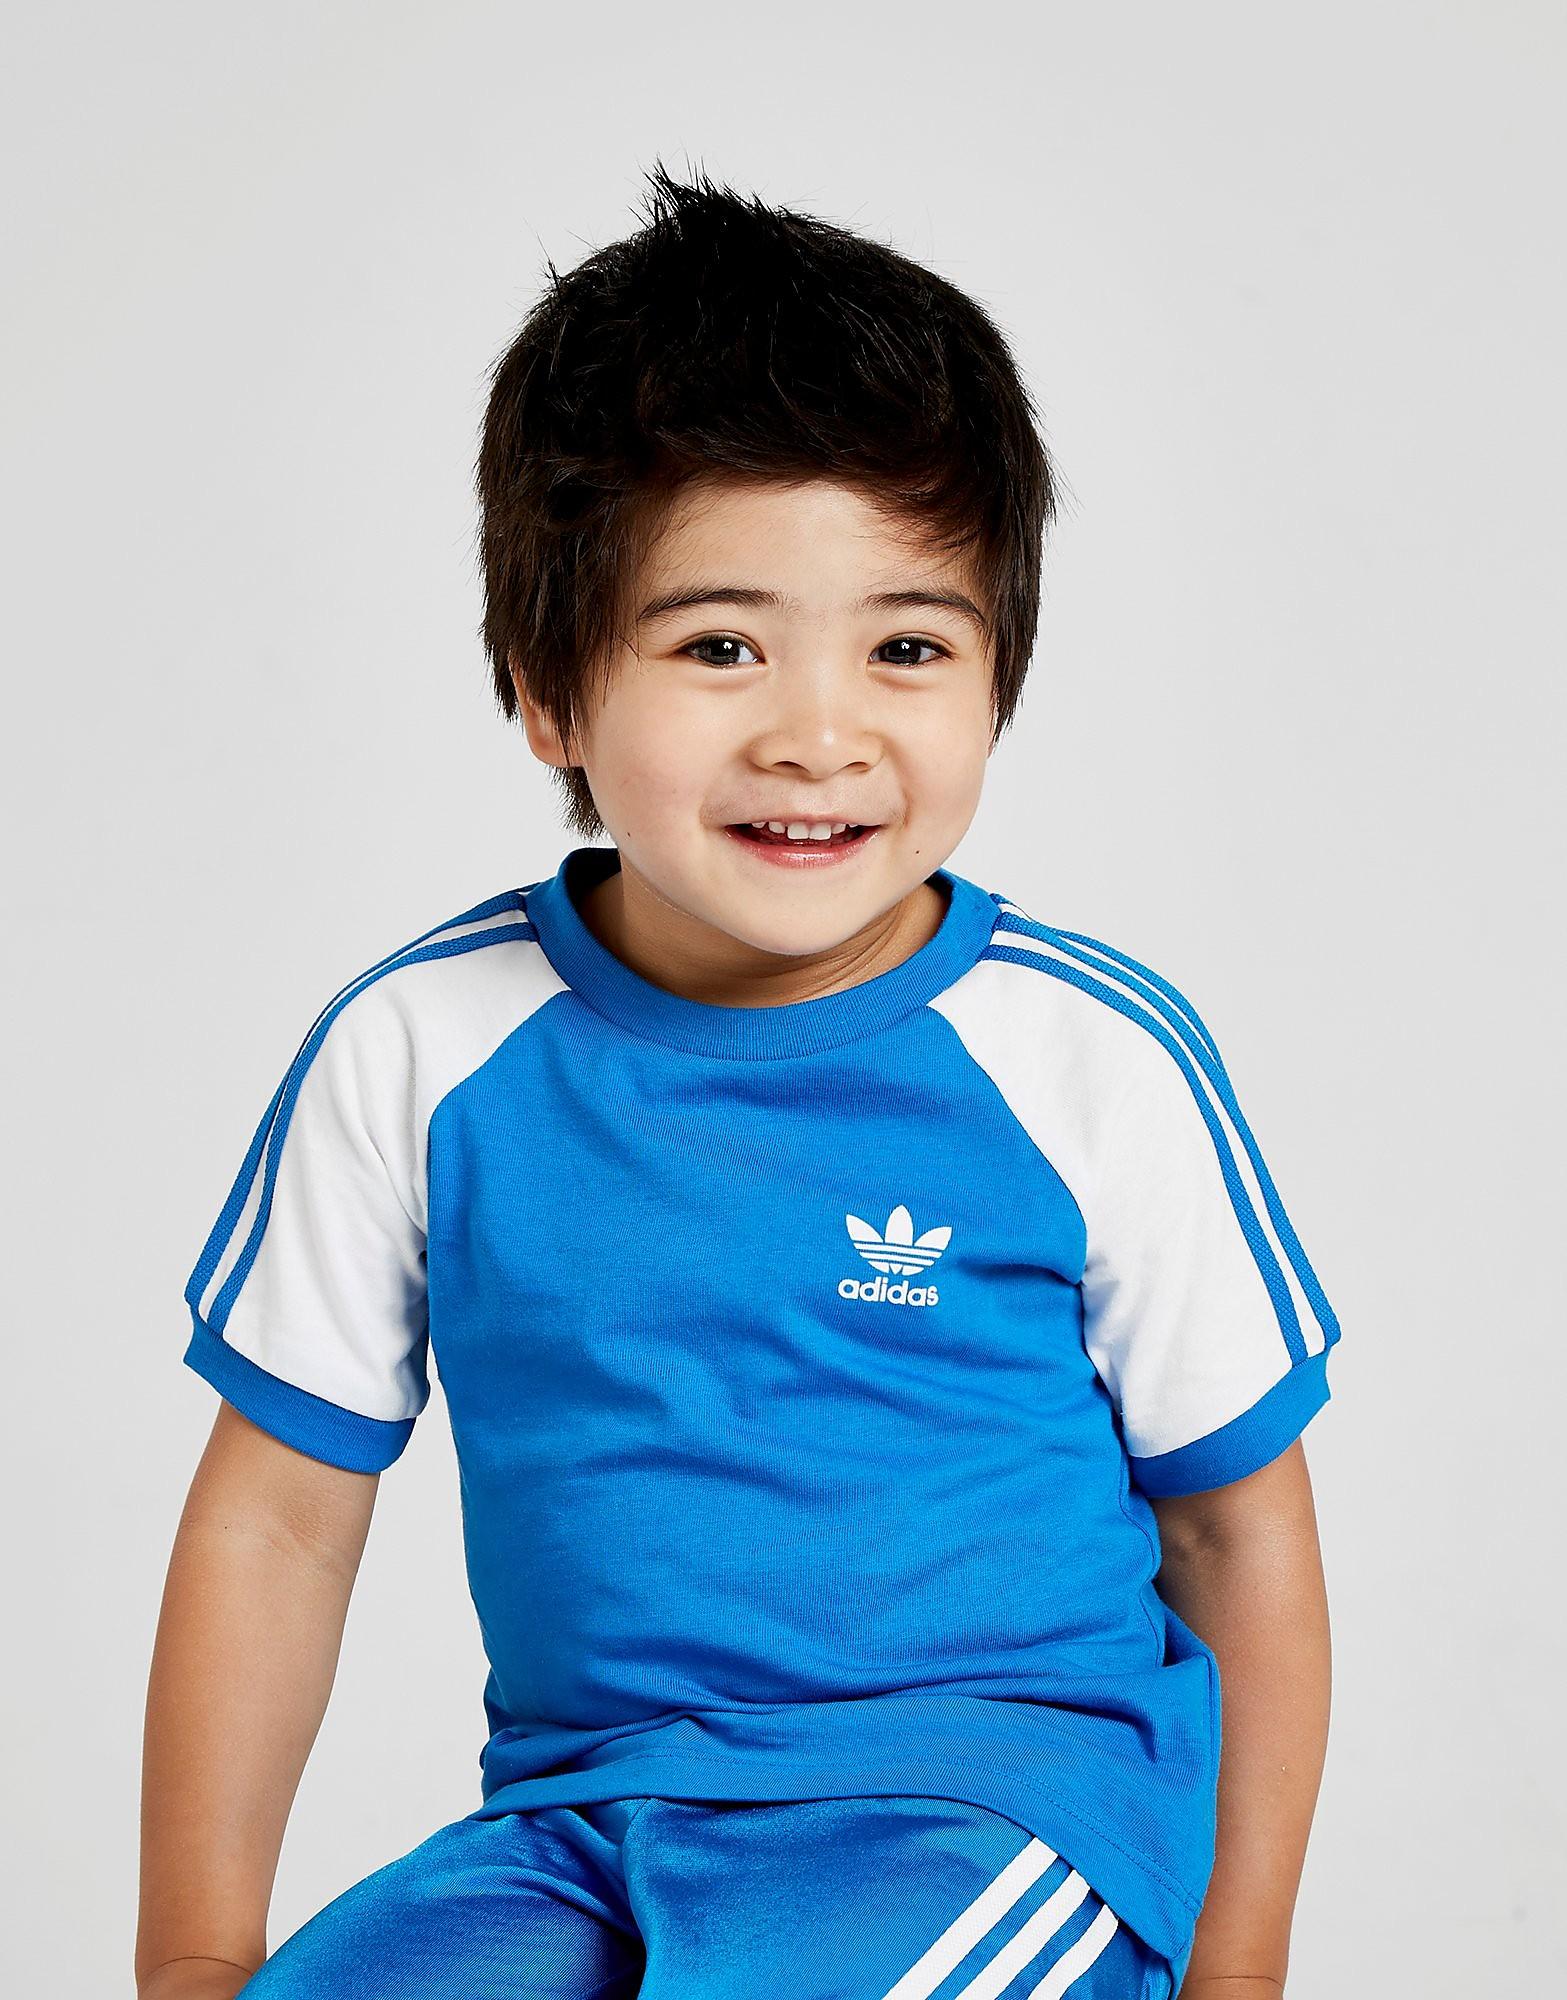 adidas Originals California Colour Block T-Shirt Baby's - Blauw - Kind